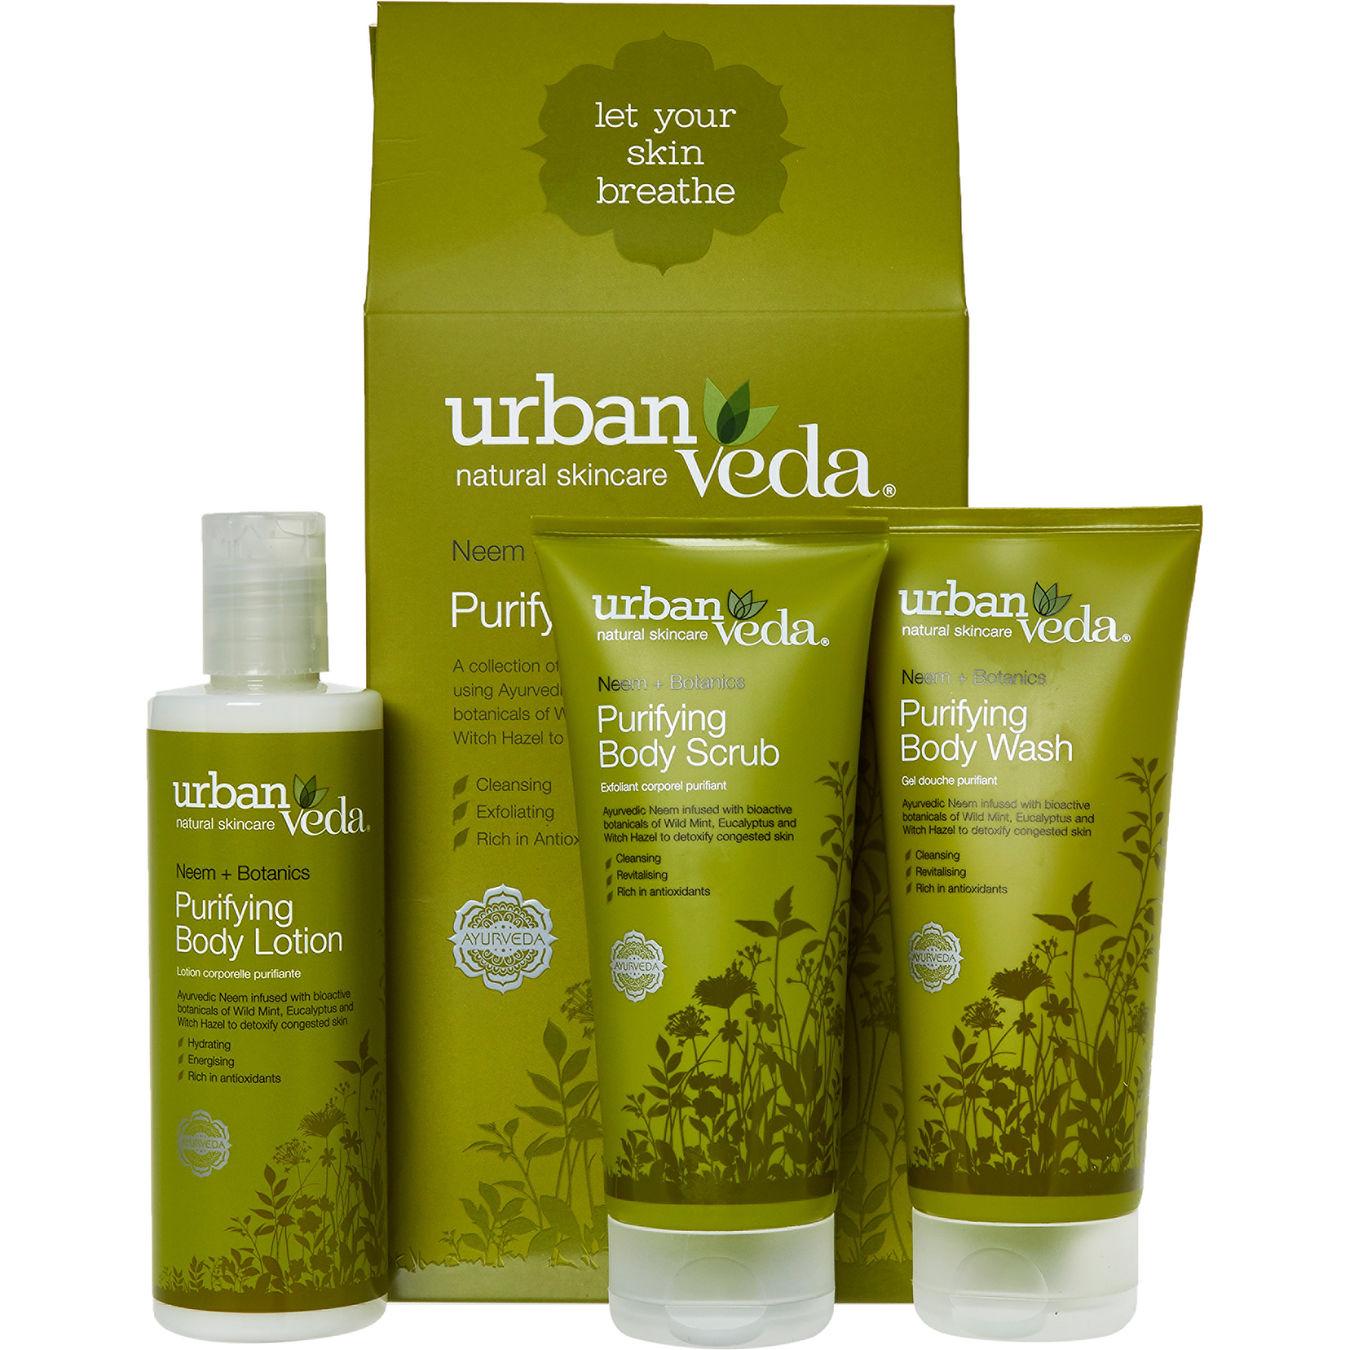 Urban Veda gift sets £11.99 + £1.99 C&C @ TK Maxx (£13.98)